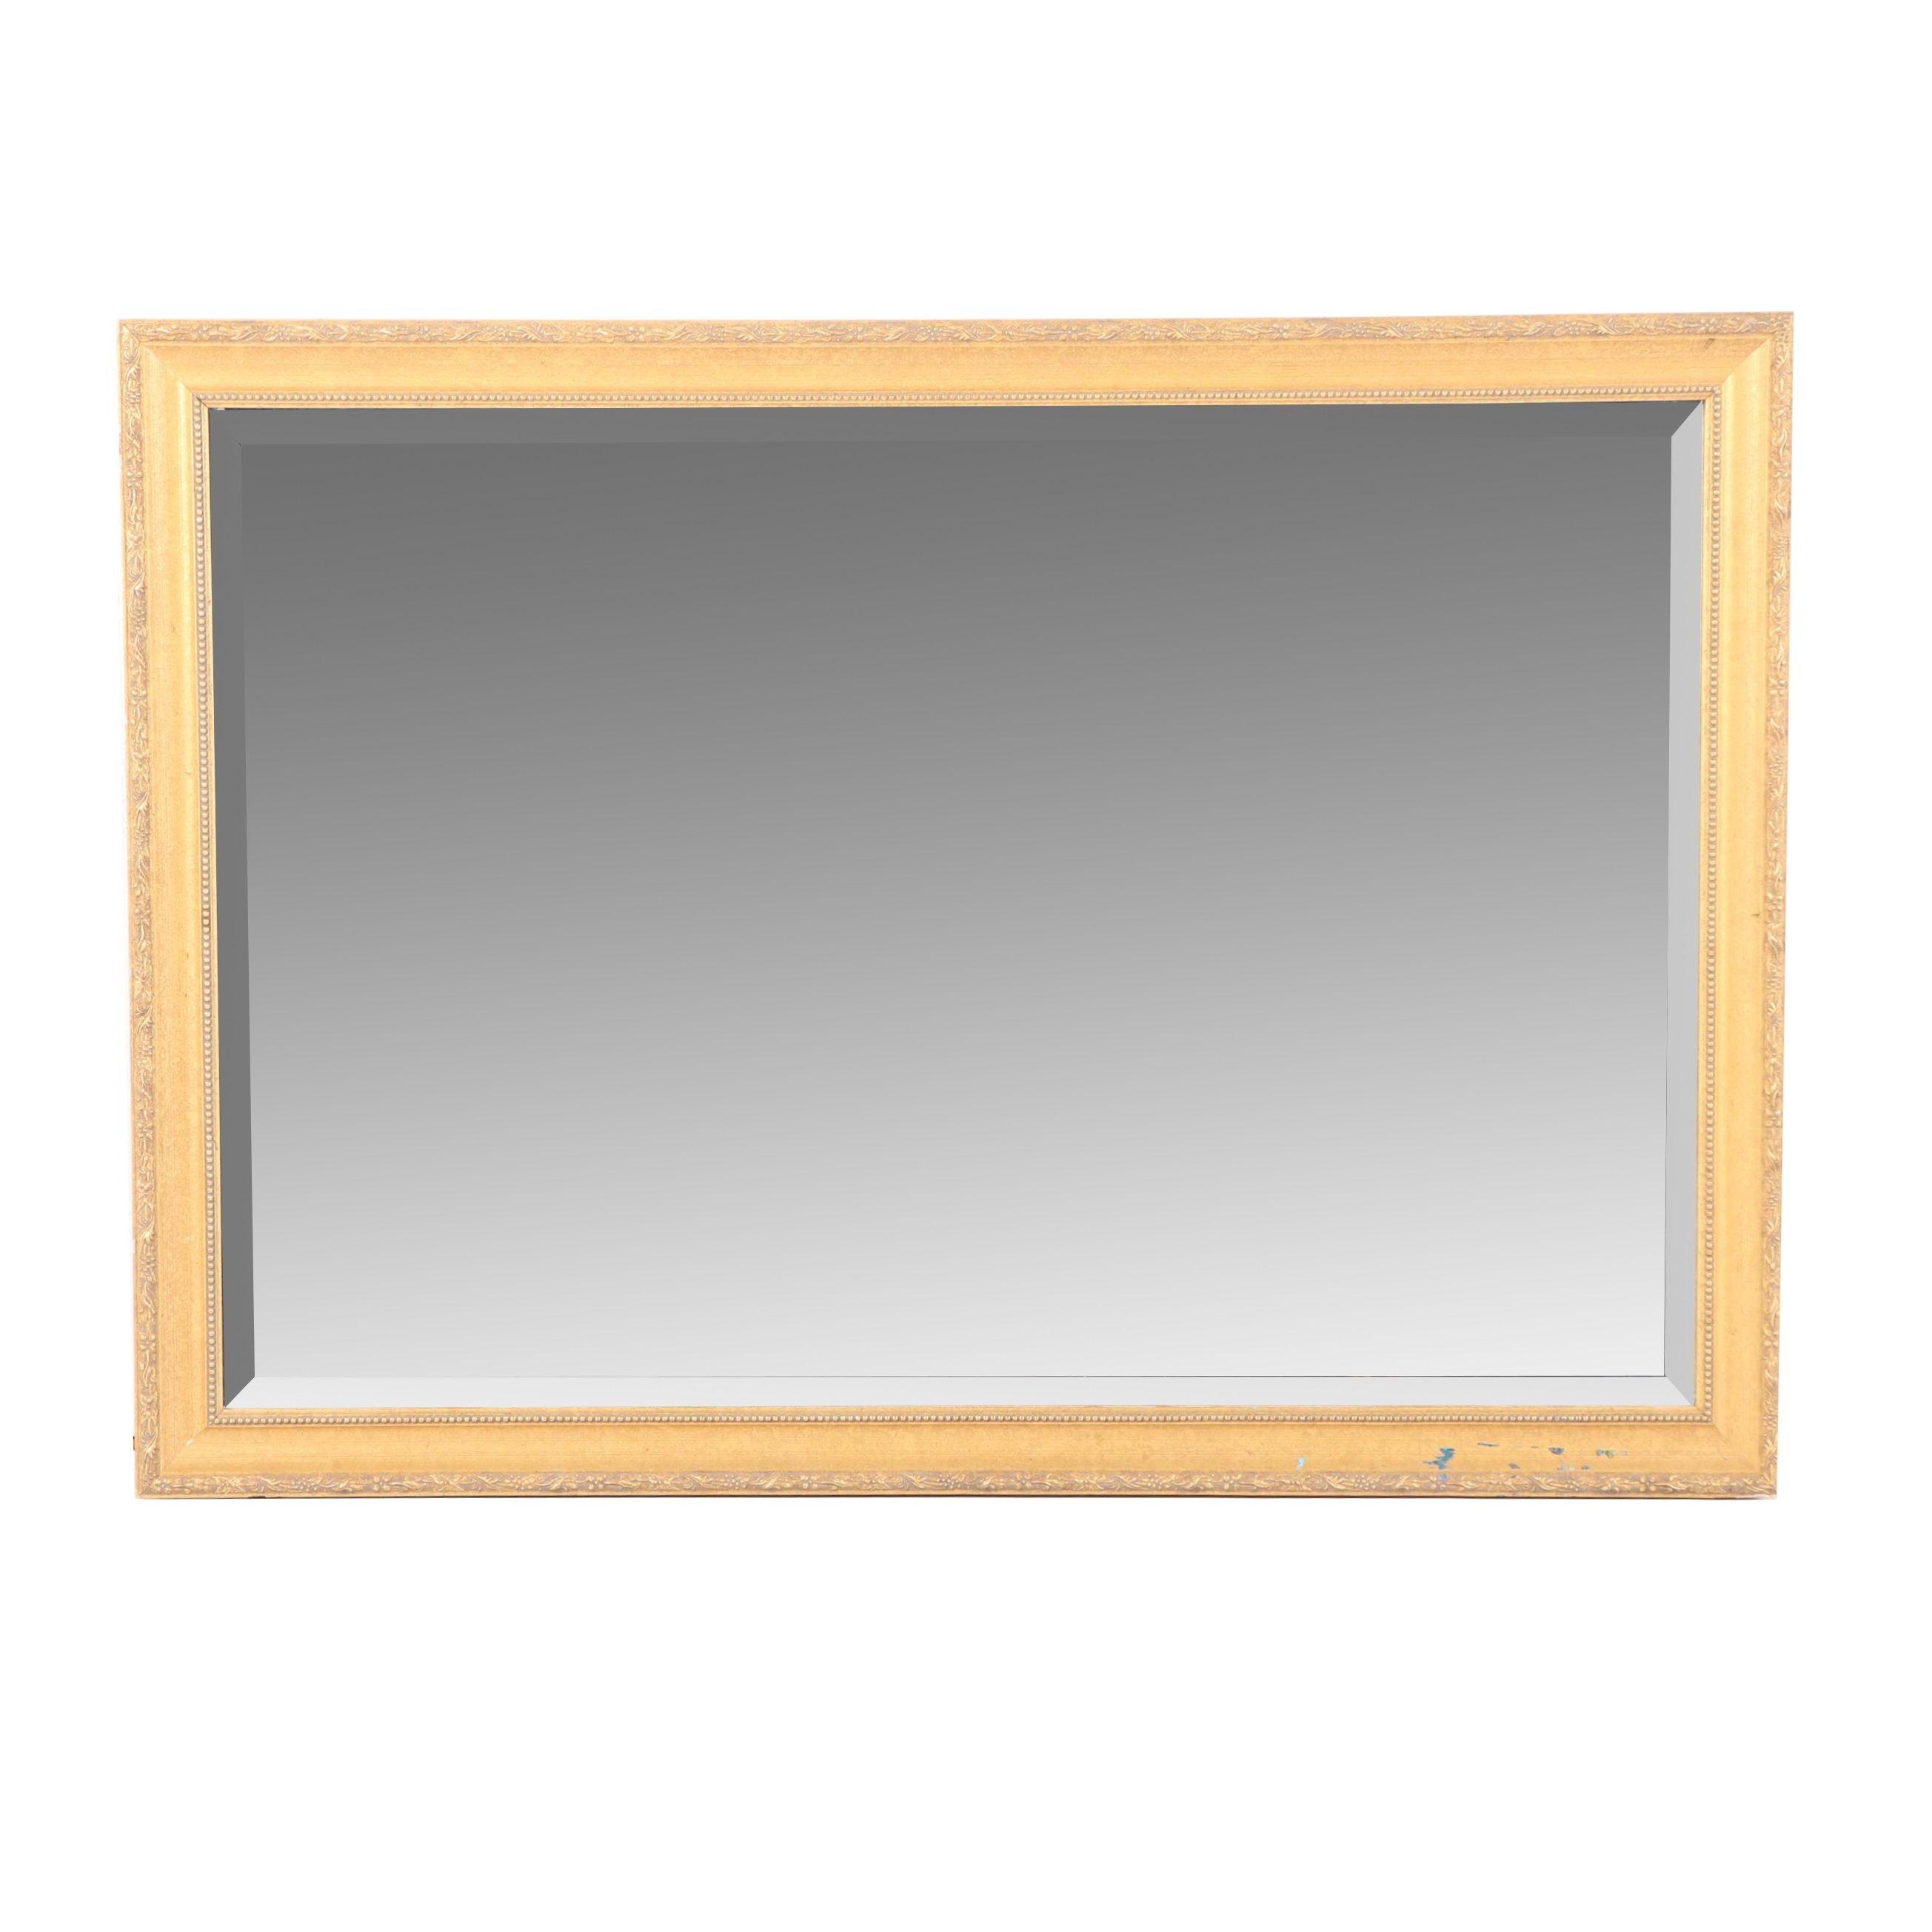 Z Gallerie Decorative Wall Mirror